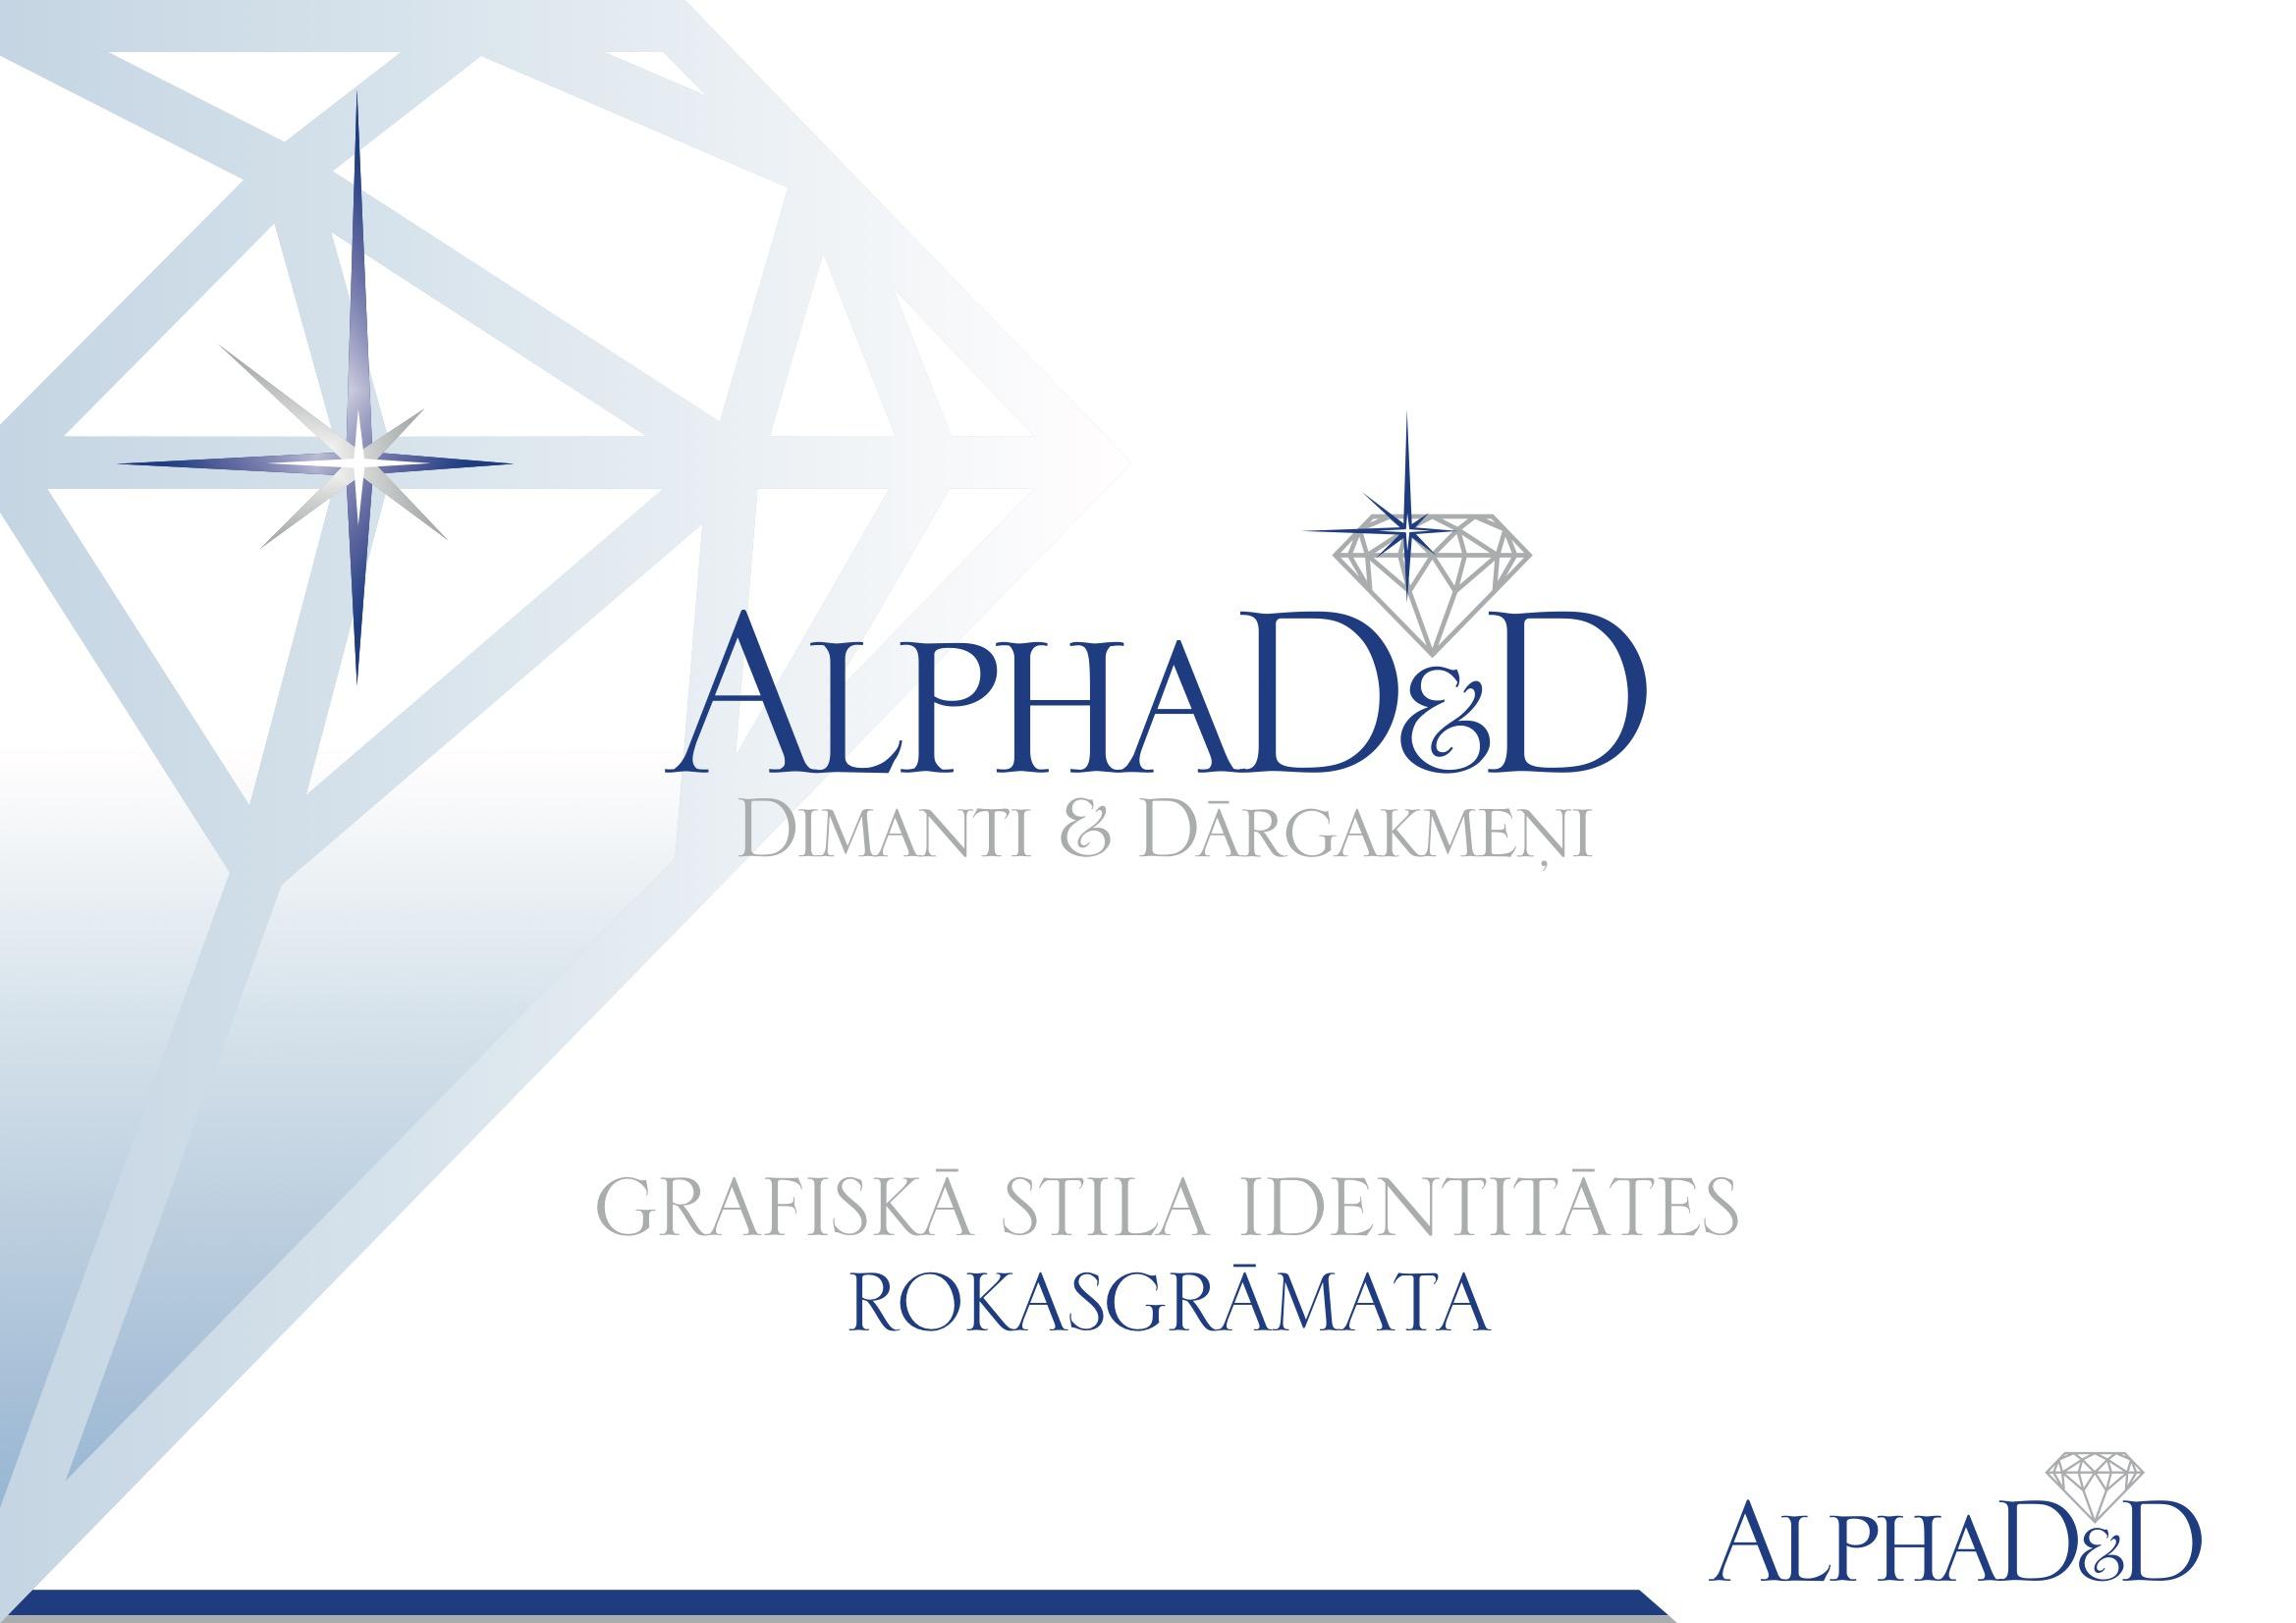 AlphaDD_Stils 1